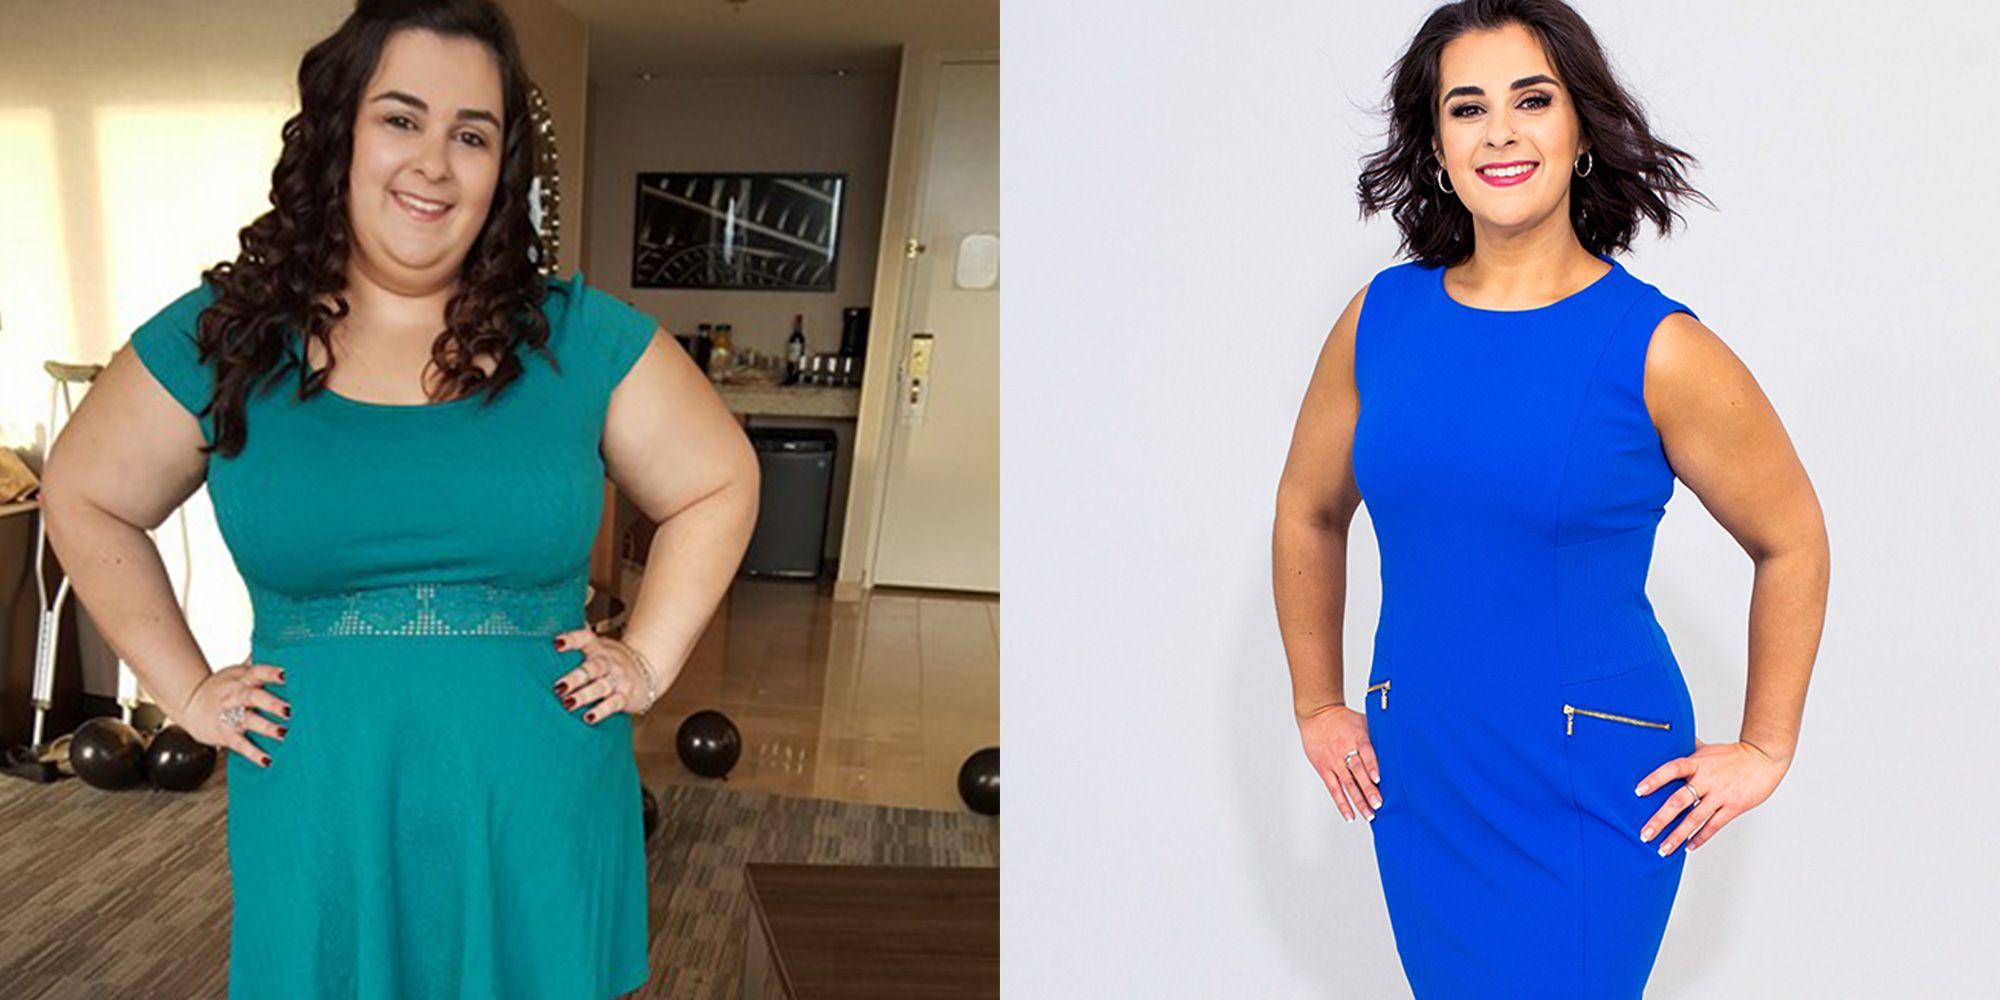 wedding photos weight loss success story